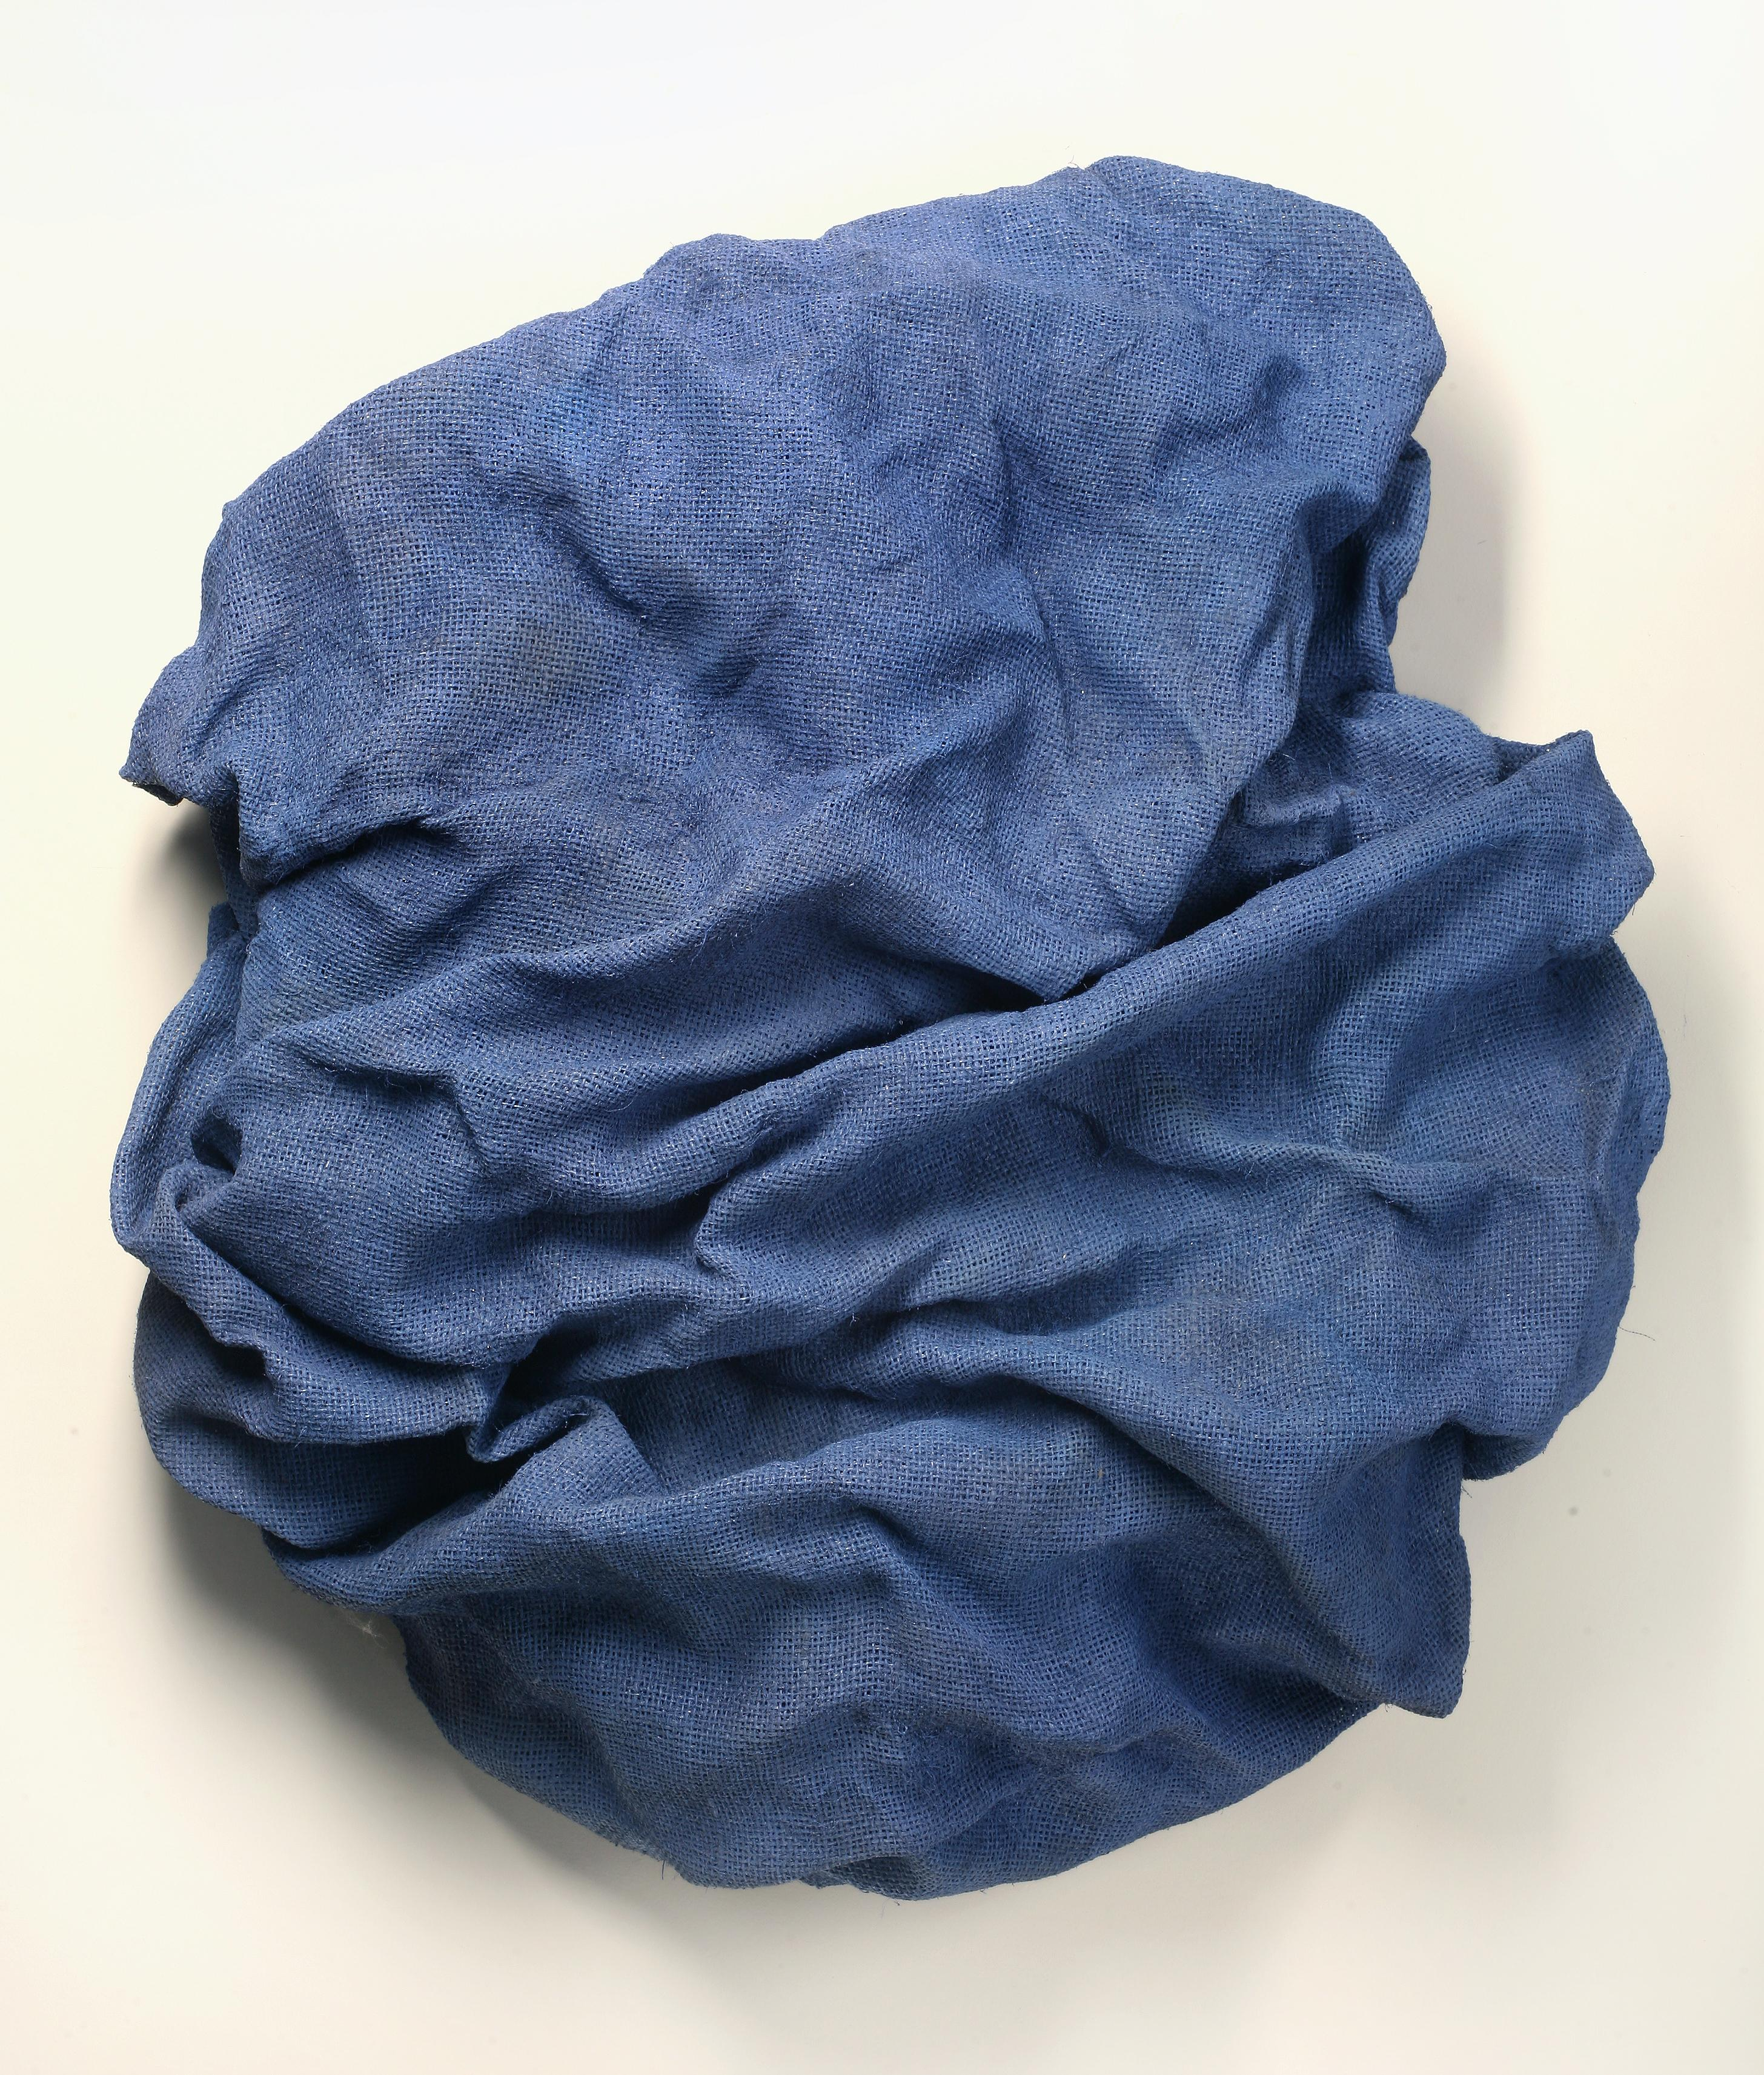 Lilac Folds (fabric art, wall sculpture, contemporary art design, textile arts)